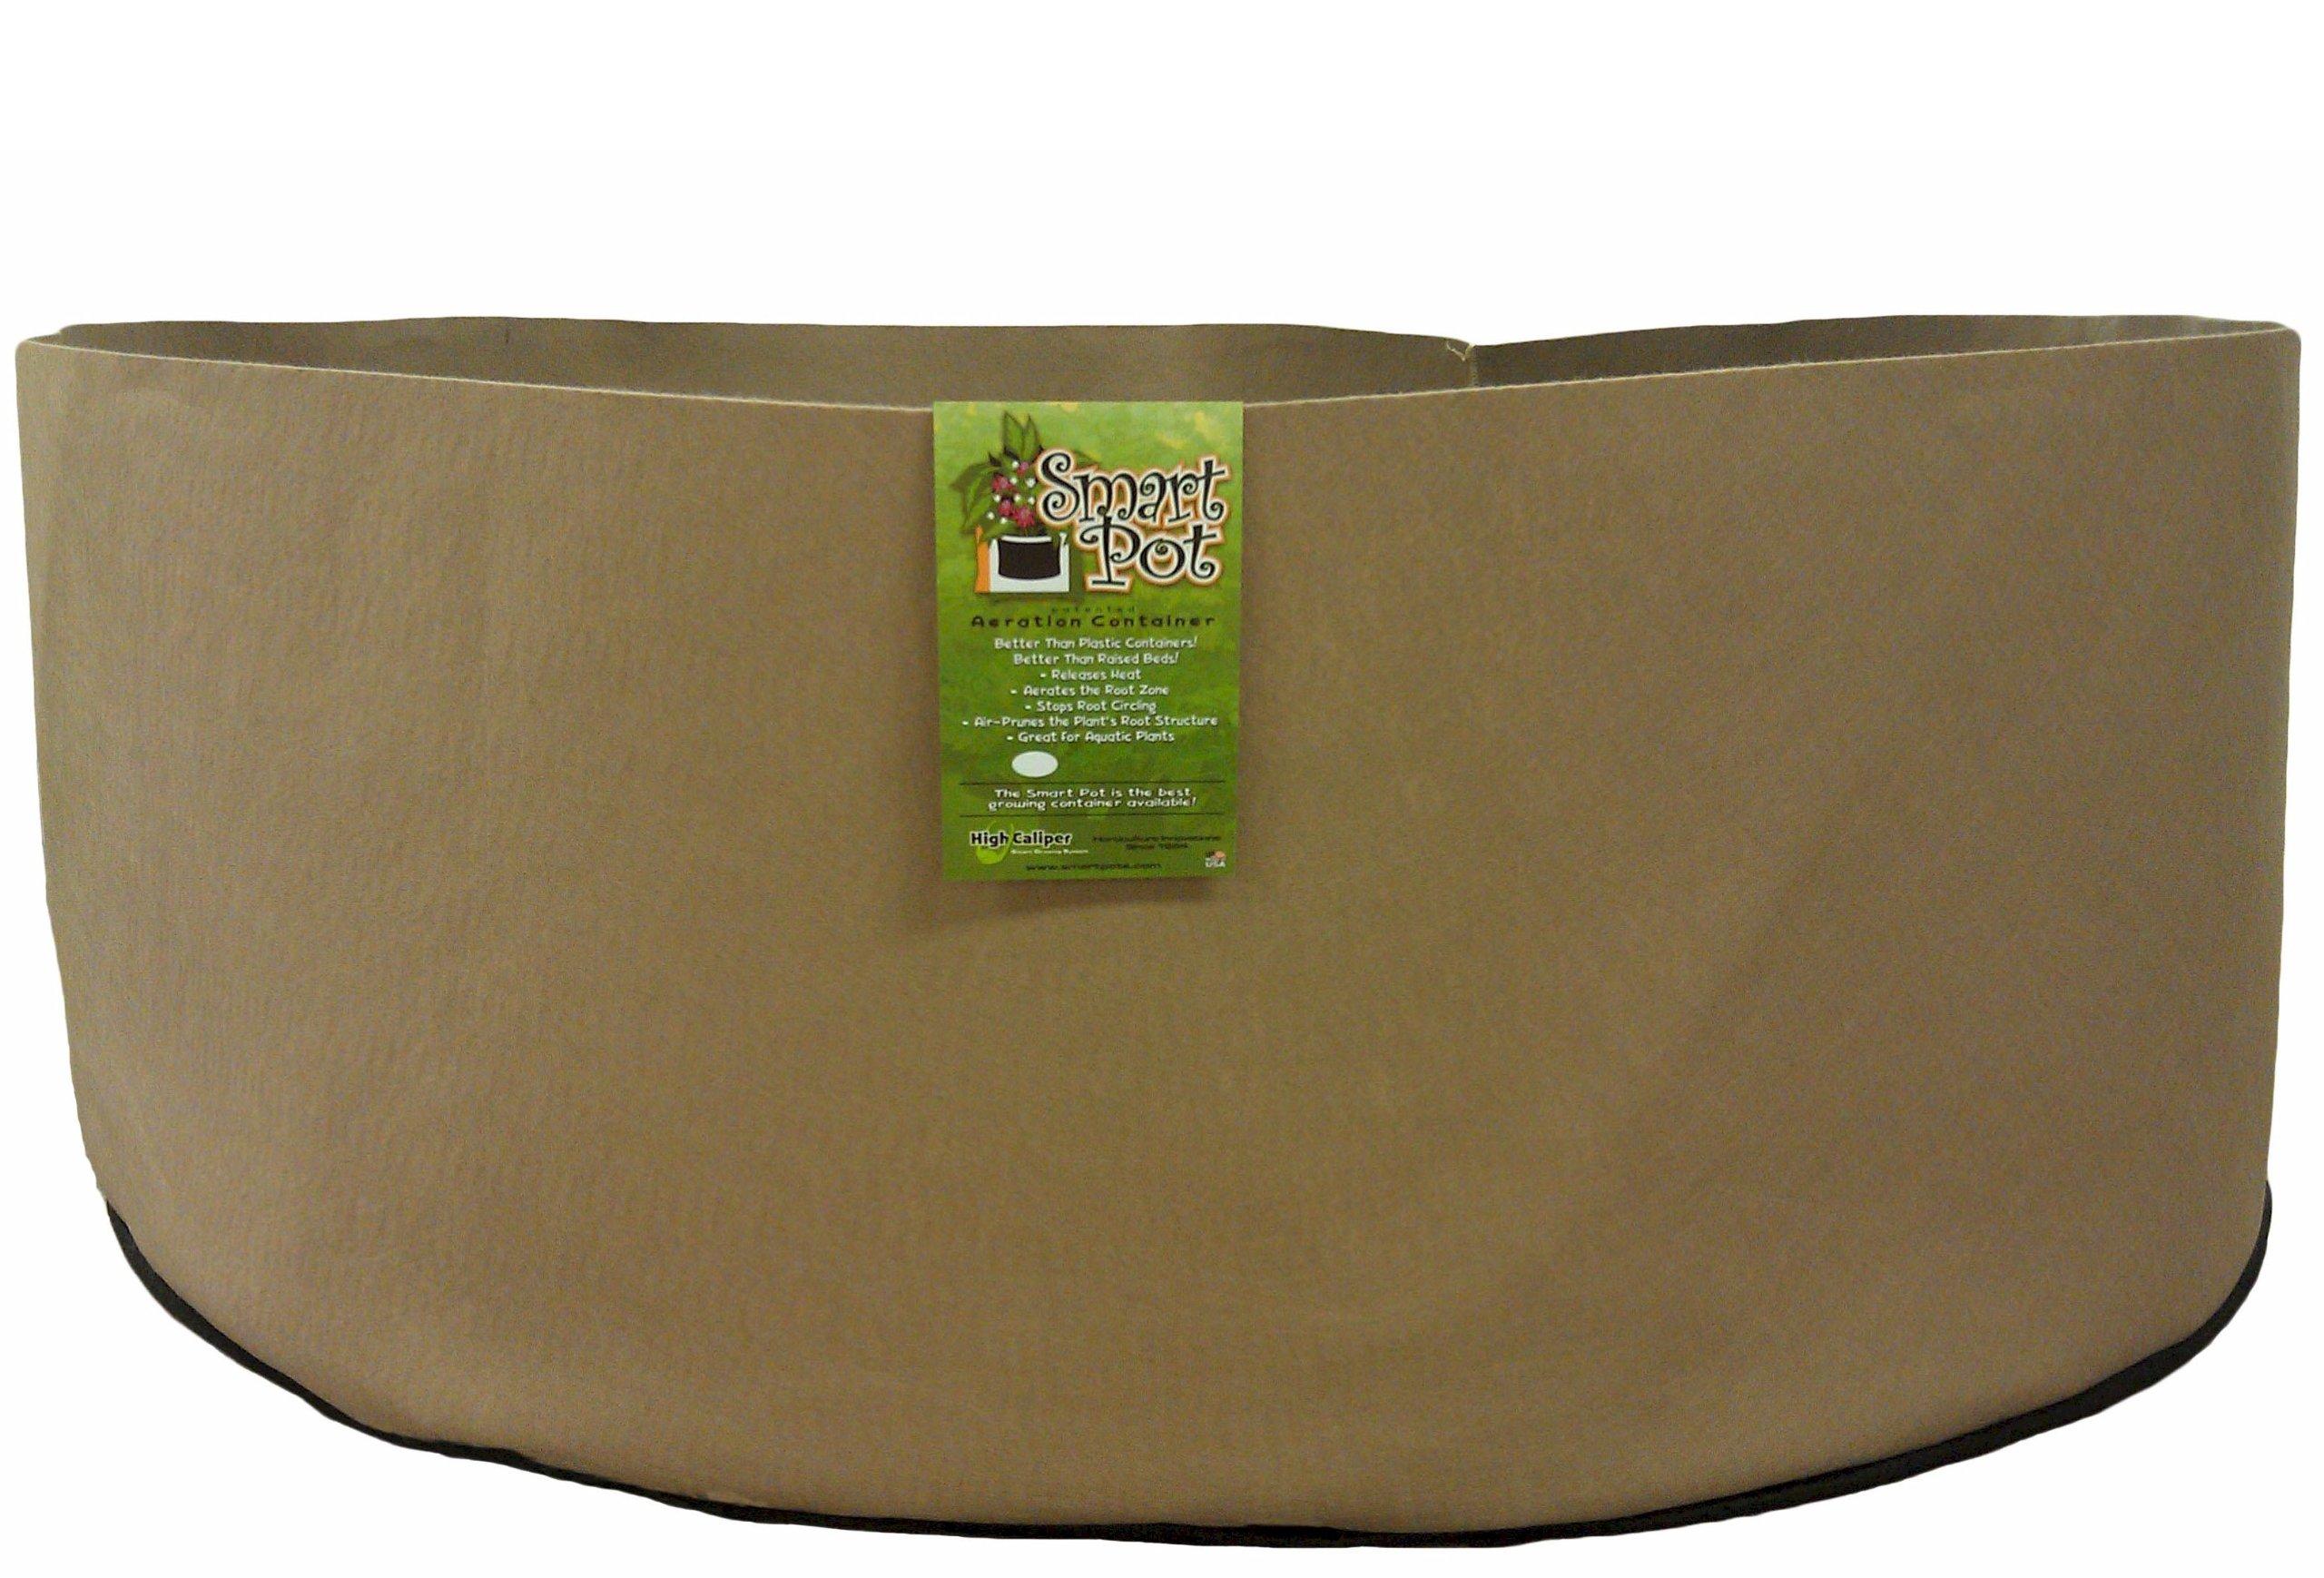 Smart Pots 1,000-Gallon Smart Pot Soft-Sided Container, Tan